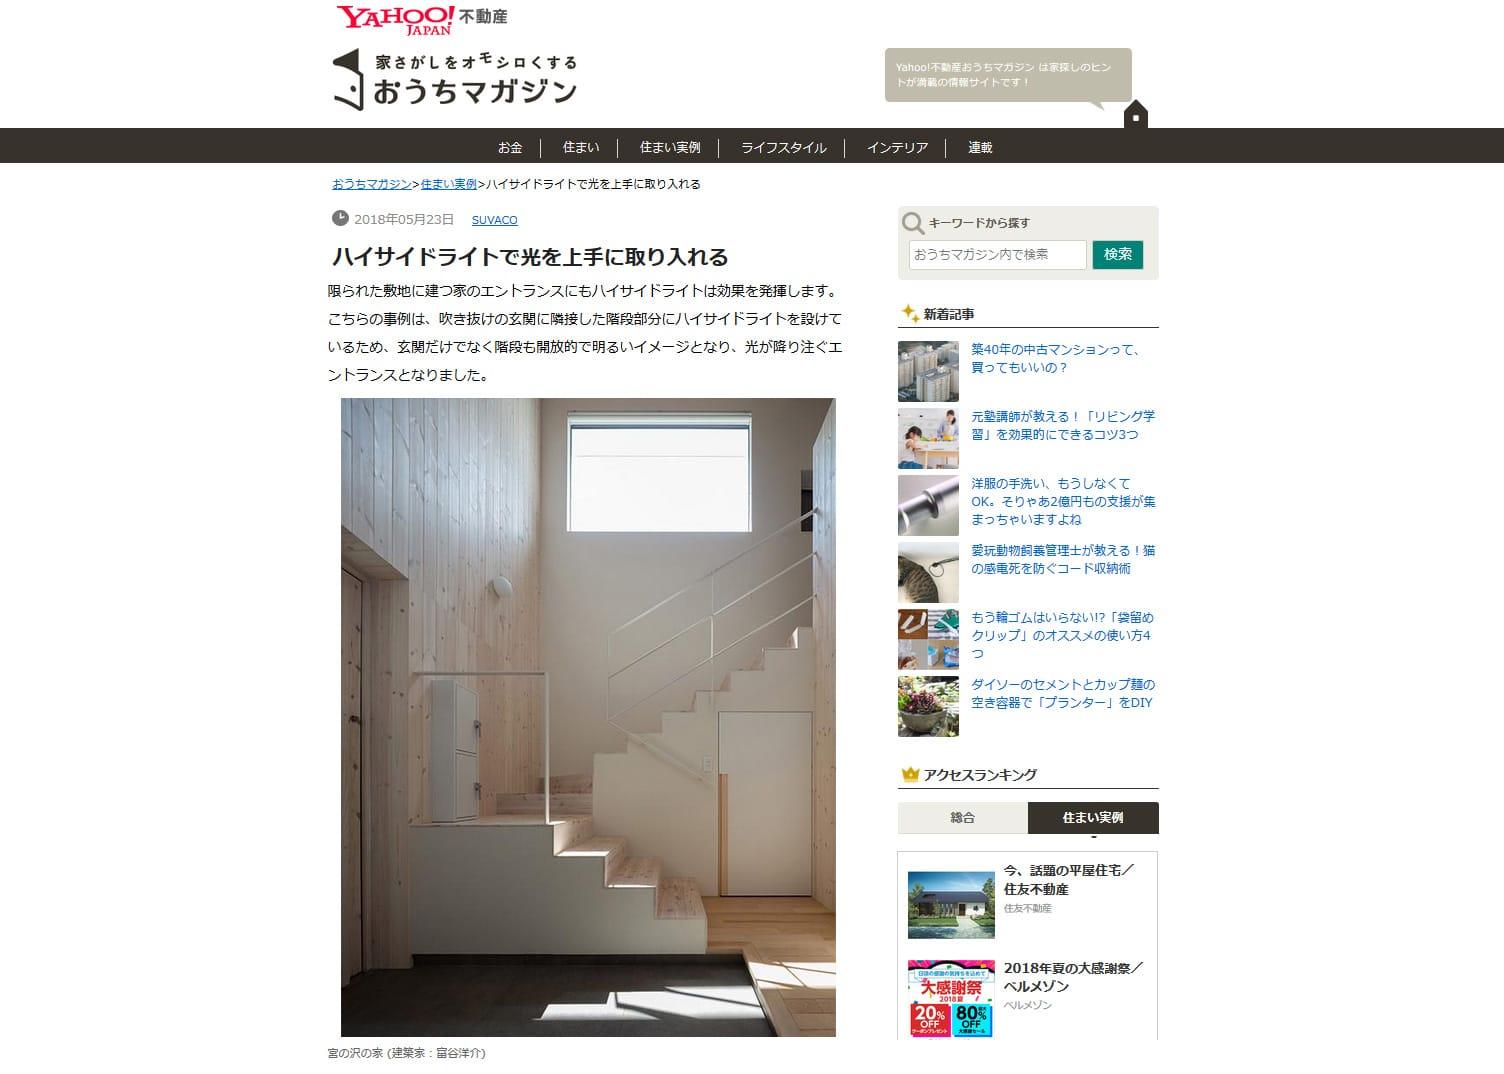 Yahoo!不動産 おうちマガジン記事に「宮の沢の家」が紹介されています。